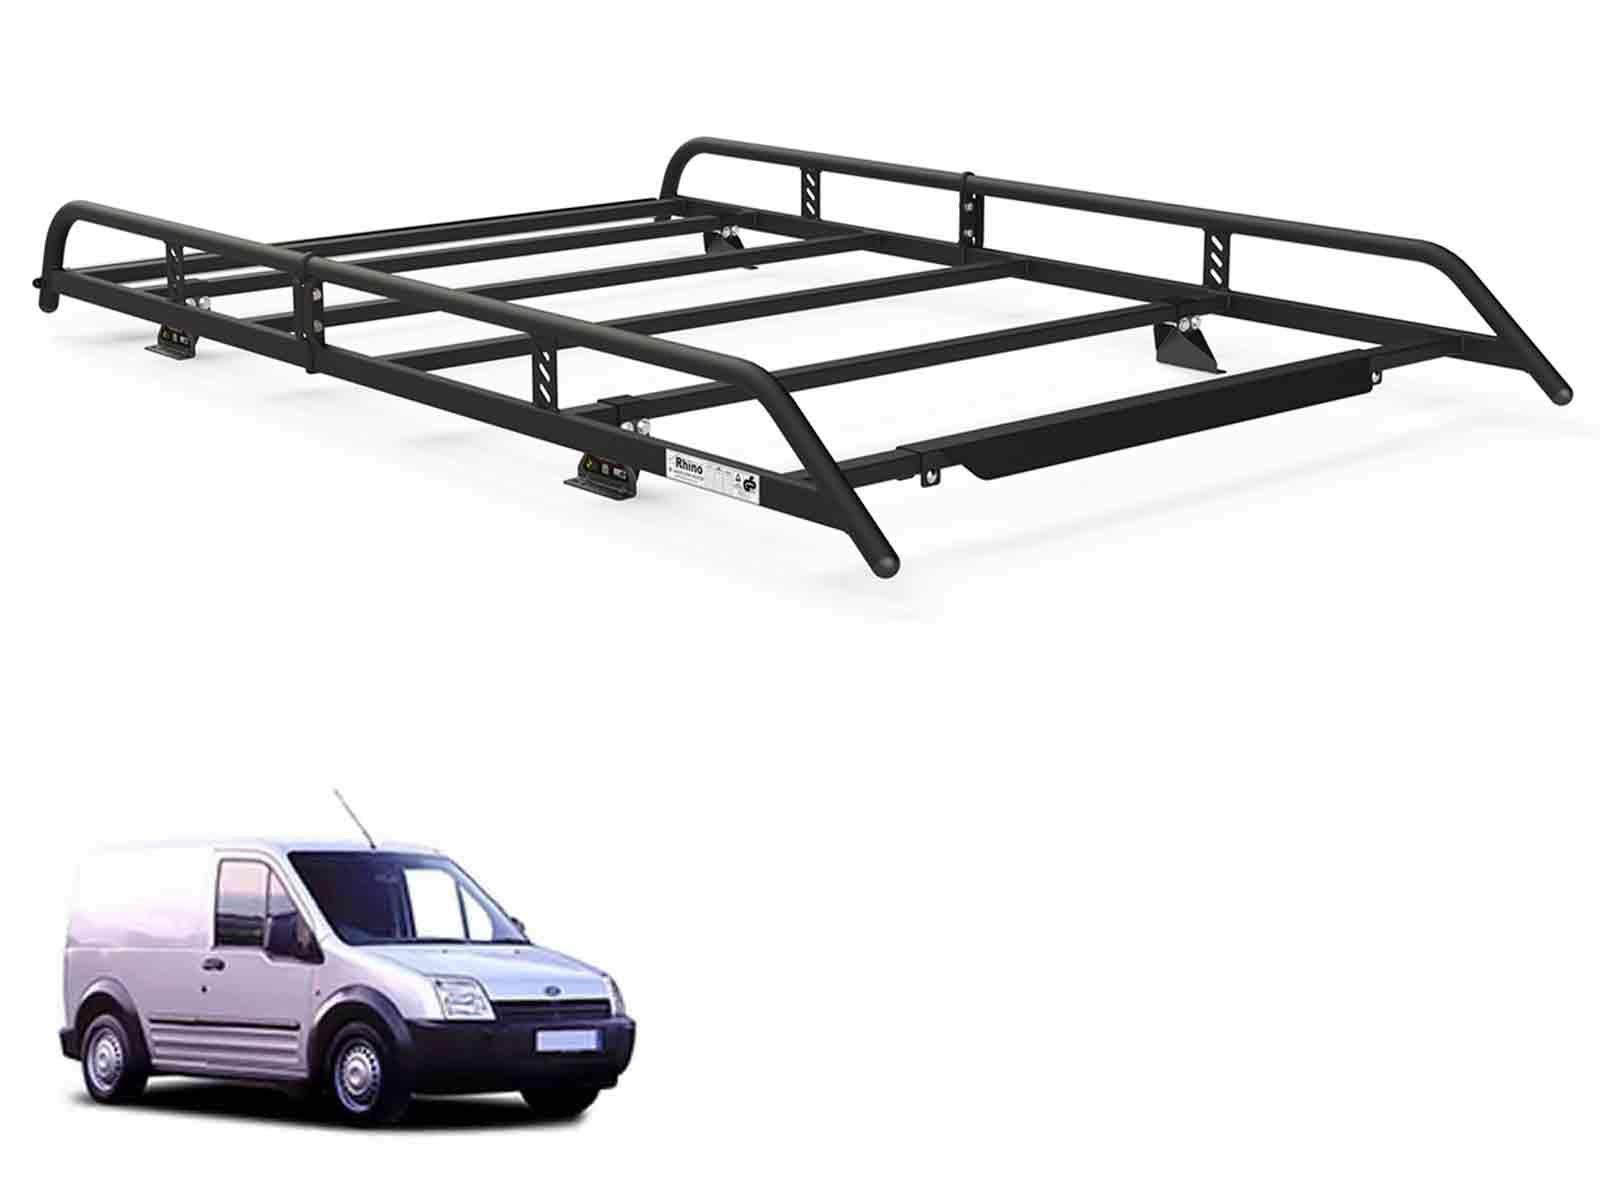 Rhino Modular Roof Rack Black Steel For Ford Transit